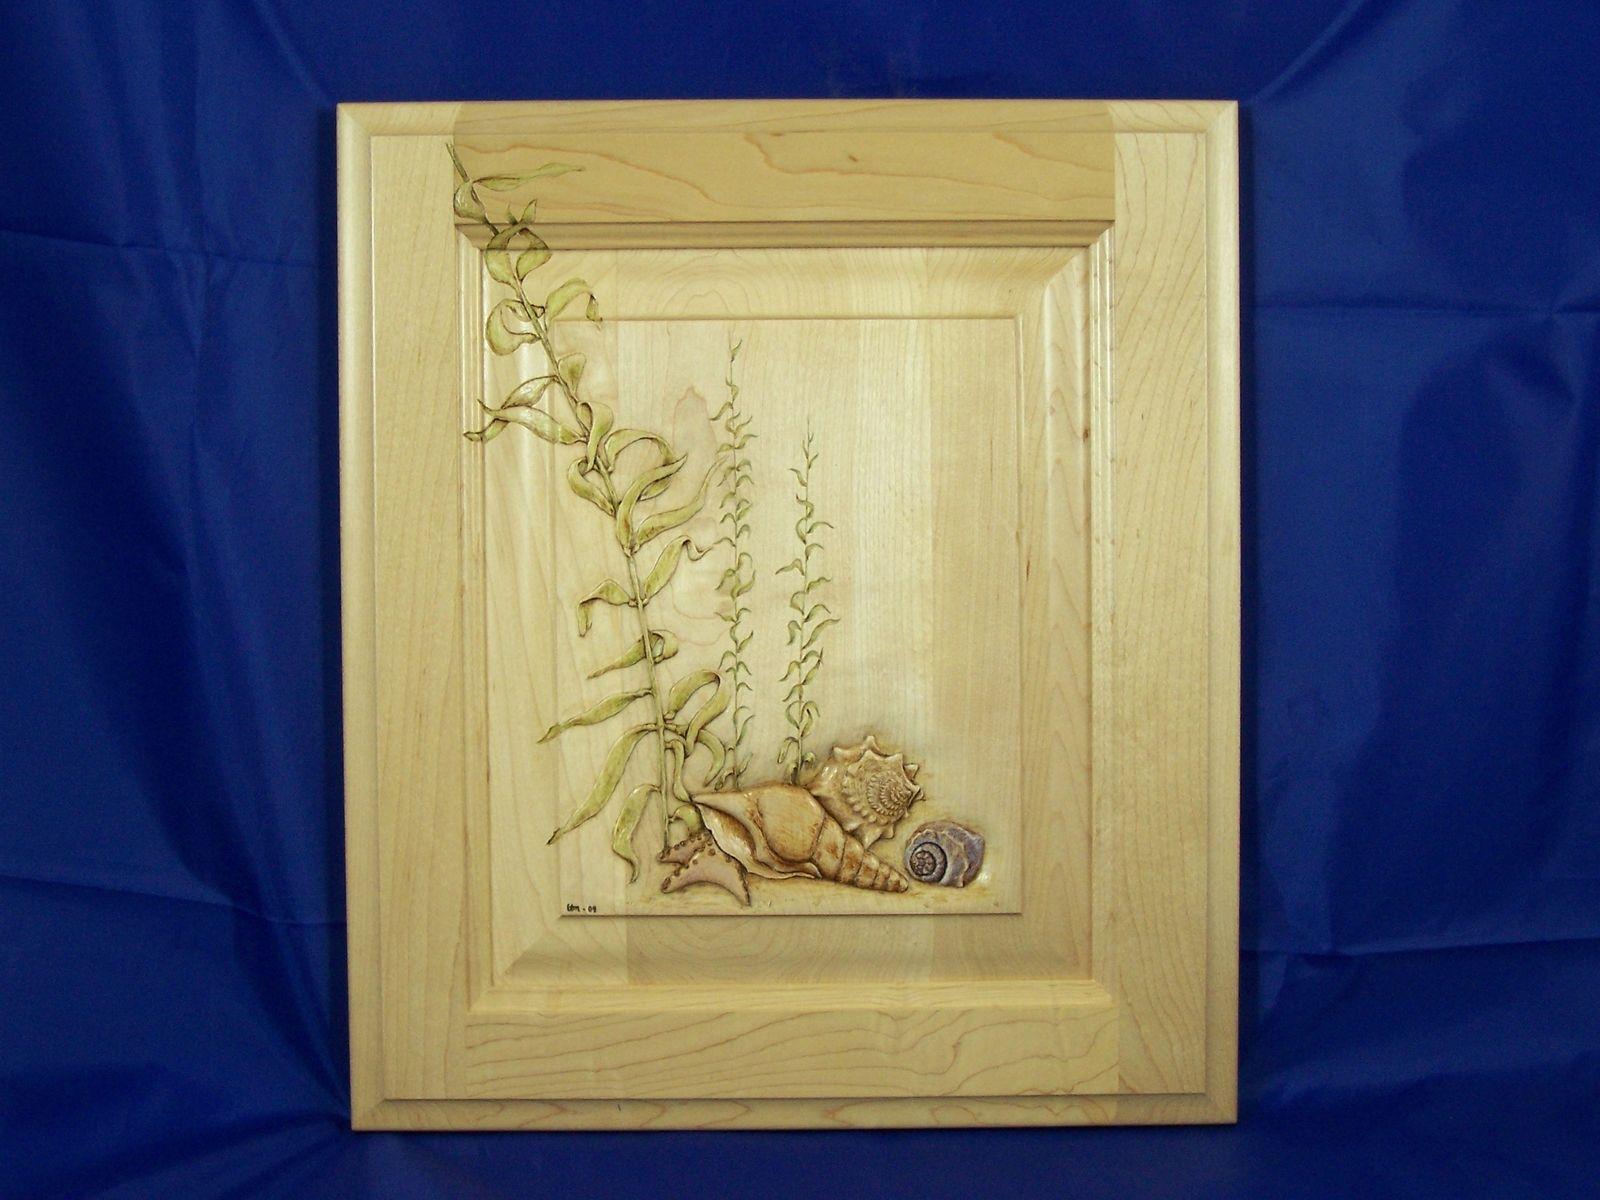 Custom cabinets door carvings by carving dreams in wood for Custom cabinet doors